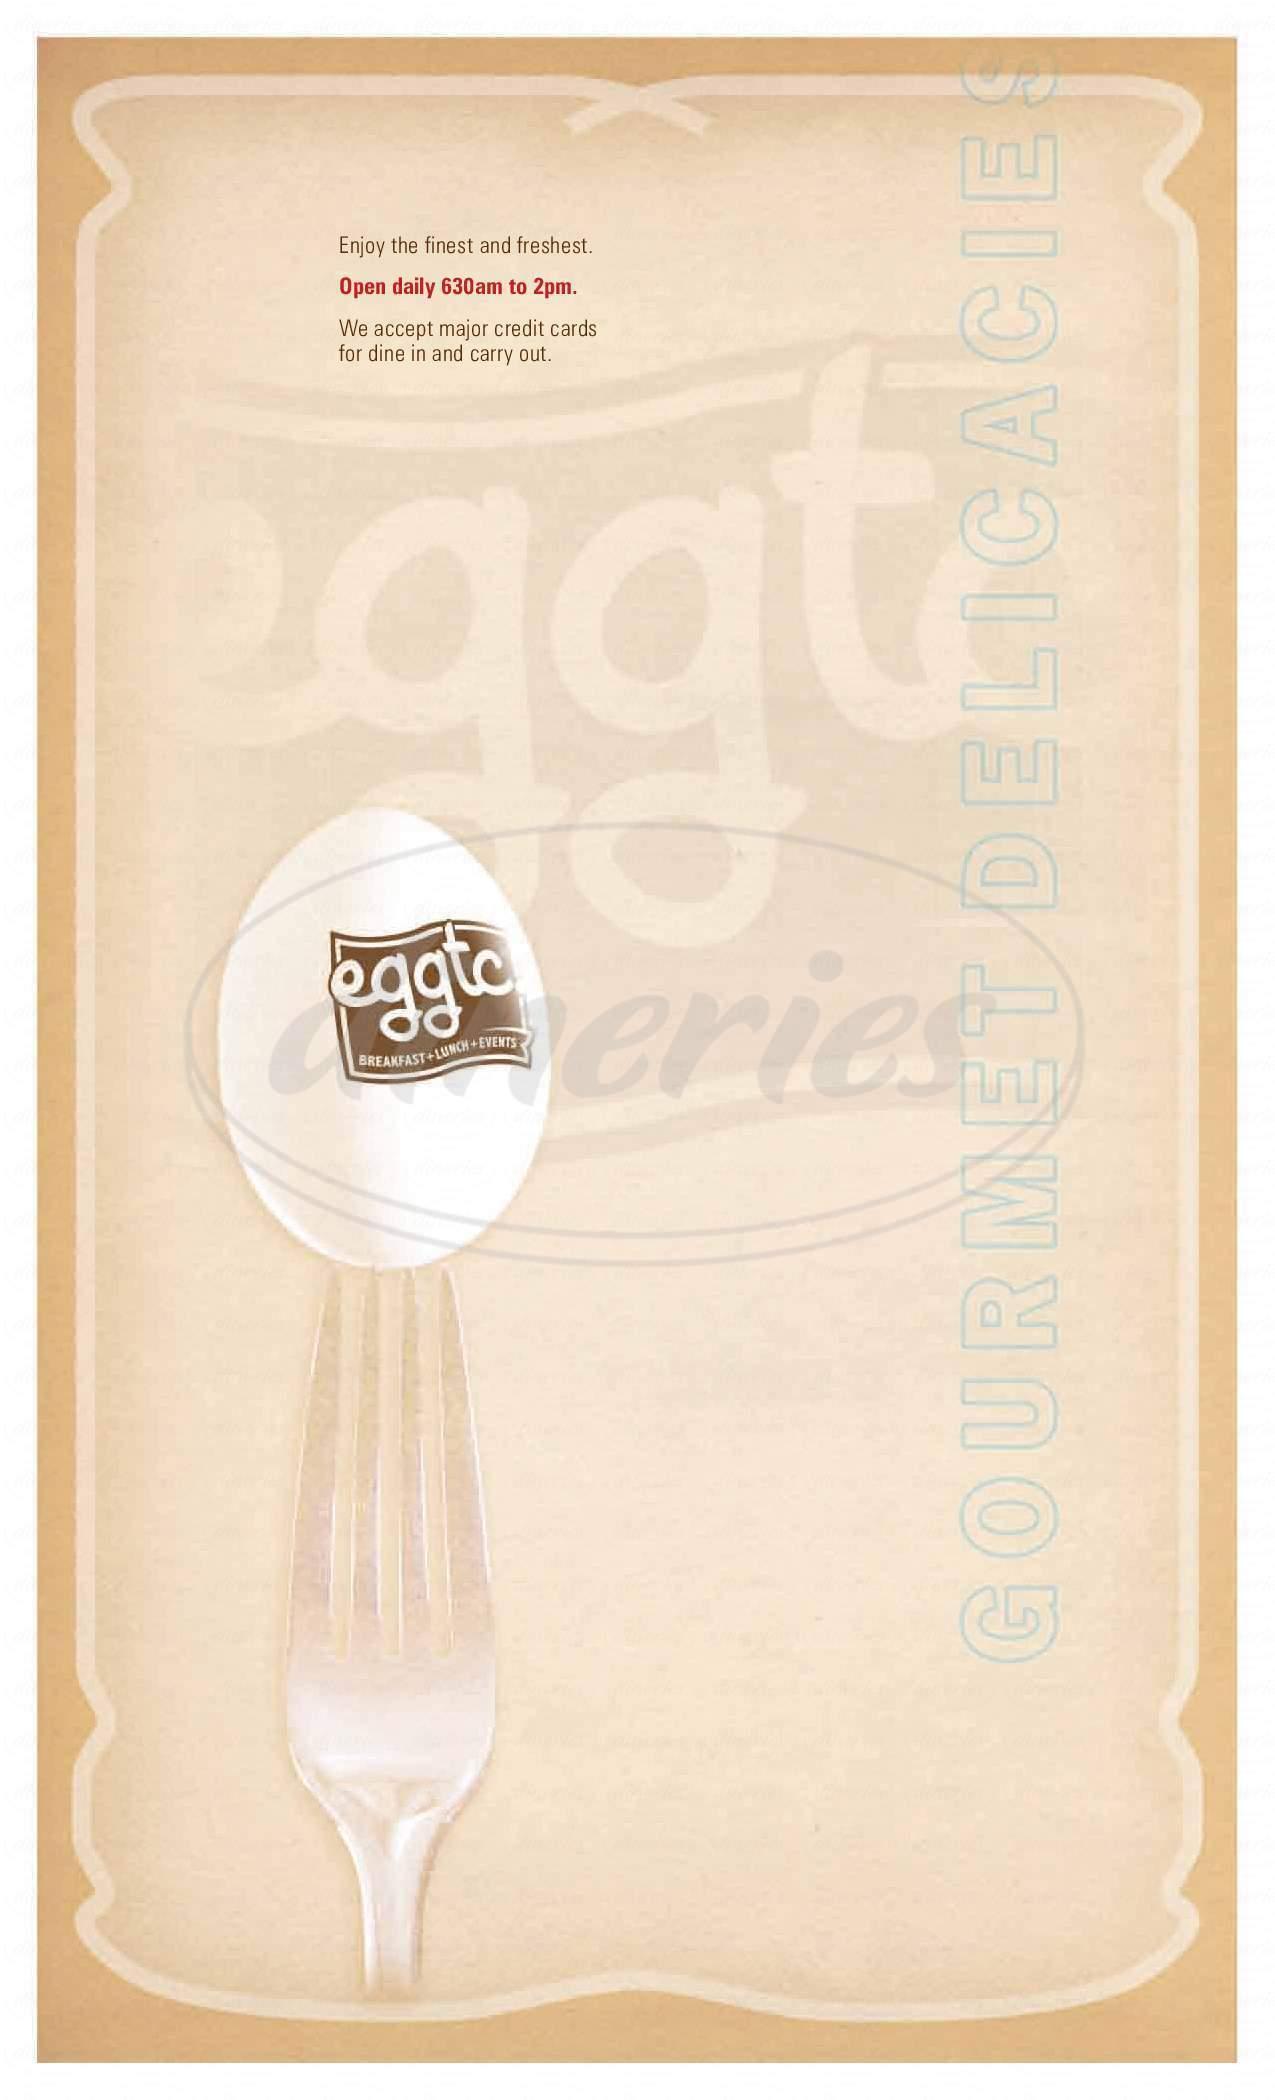 menu for Eggtc.